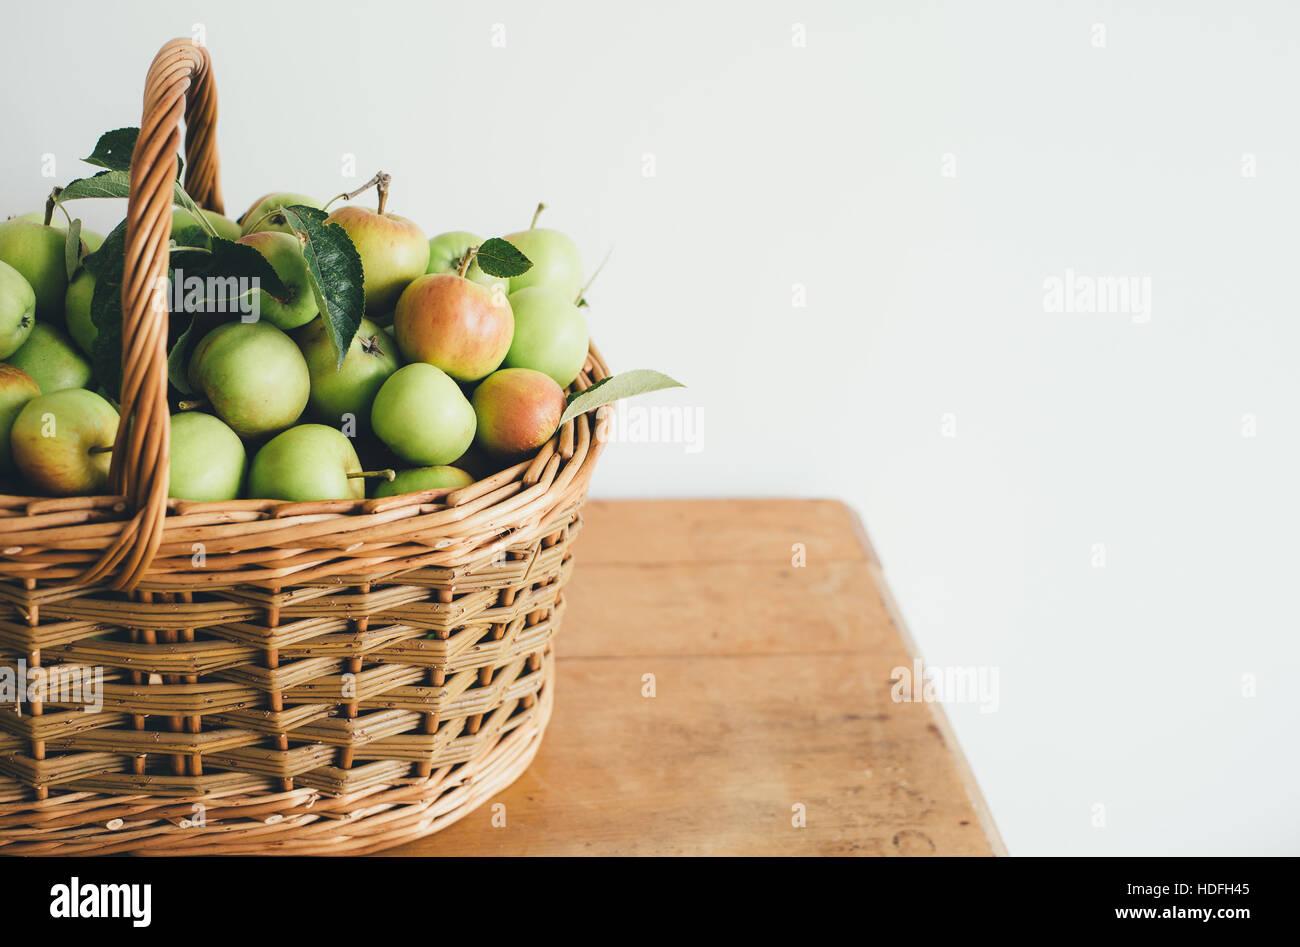 Basket of apples - Stock Image